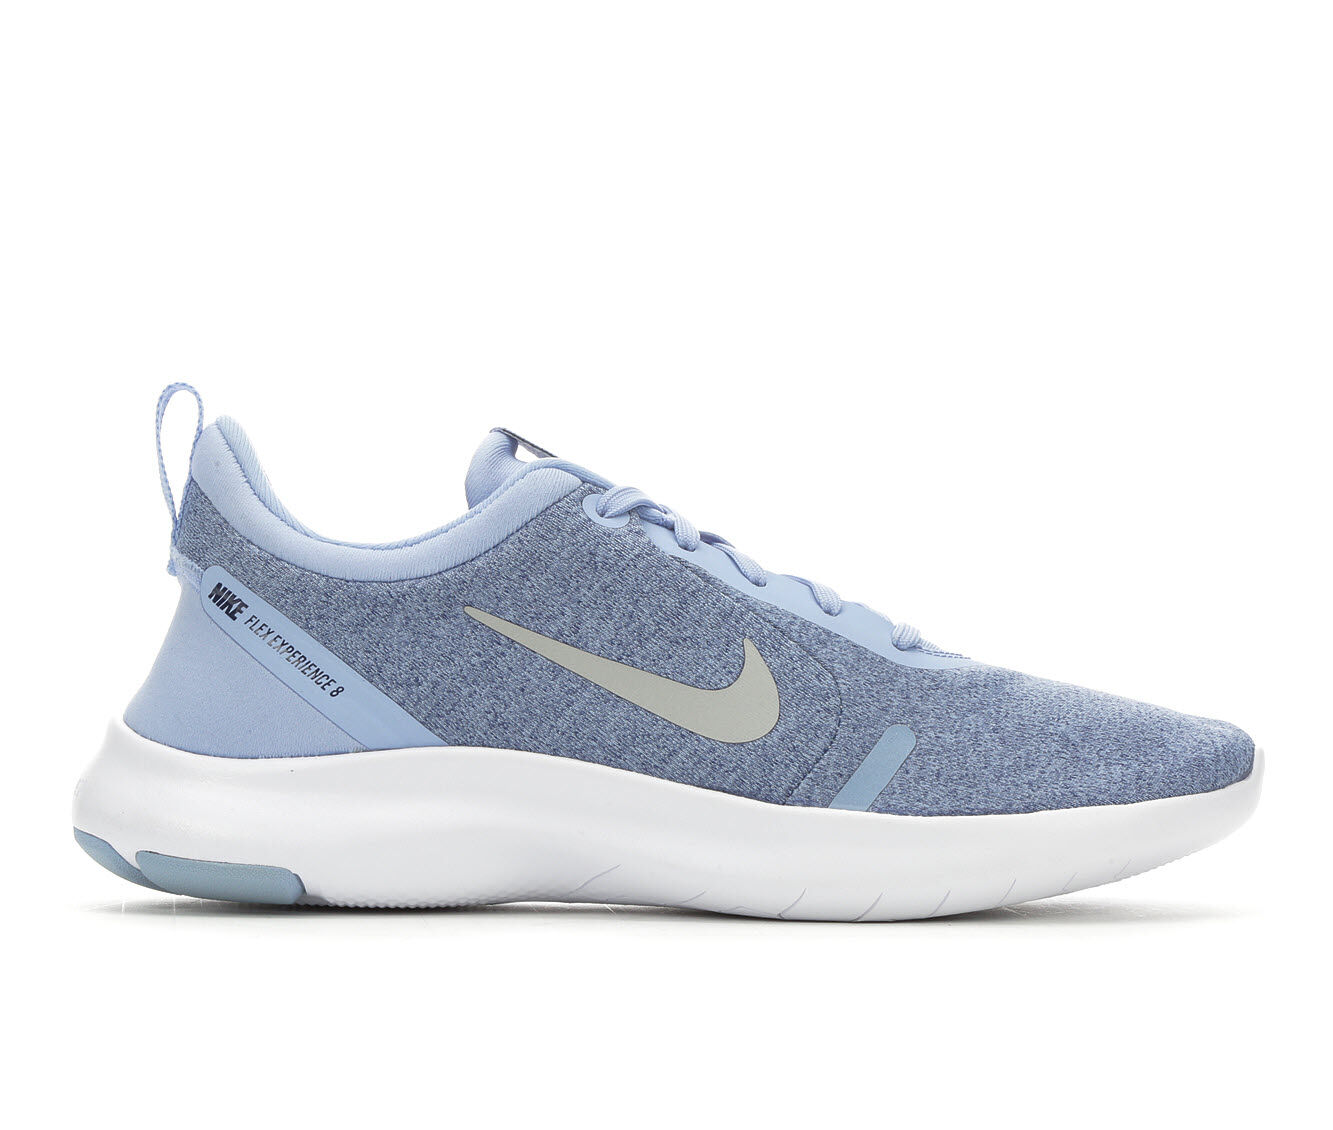 big discount Women's Nike Flex Experience Run 8 Running Shoes Blue/White/Slv